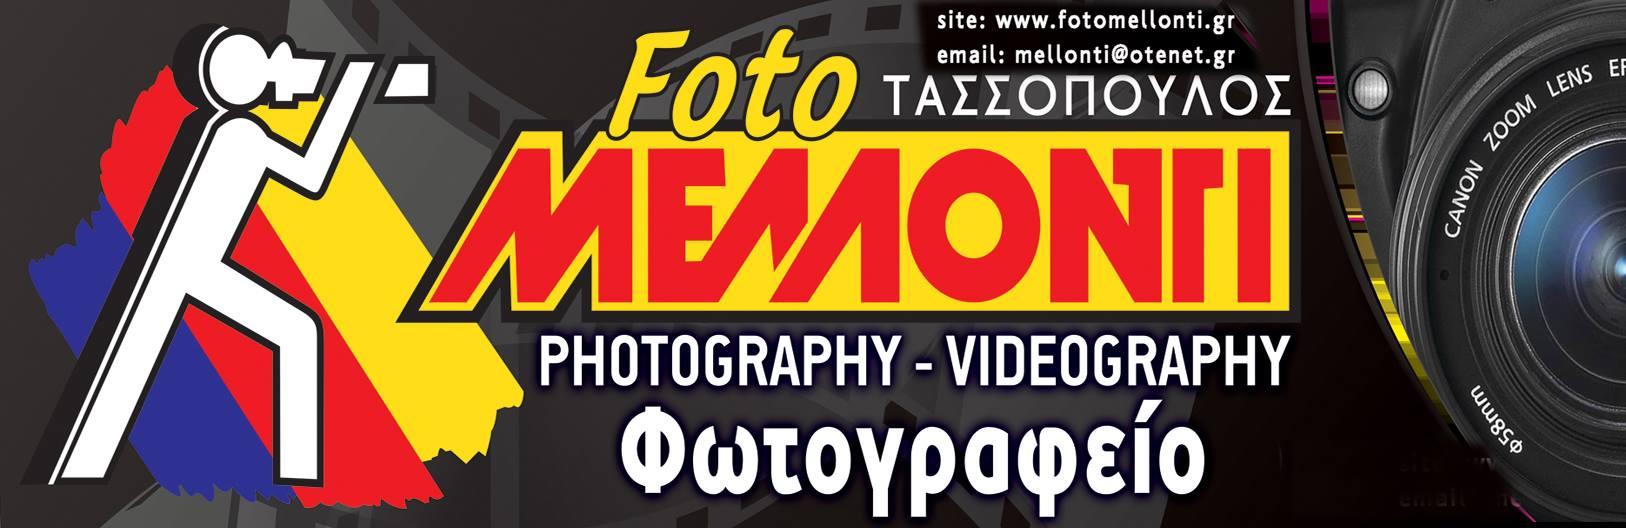 FotoMellonti Κάθε φωτογραφία όπως και κάθε εκτύπωση είναι μοναδική 2